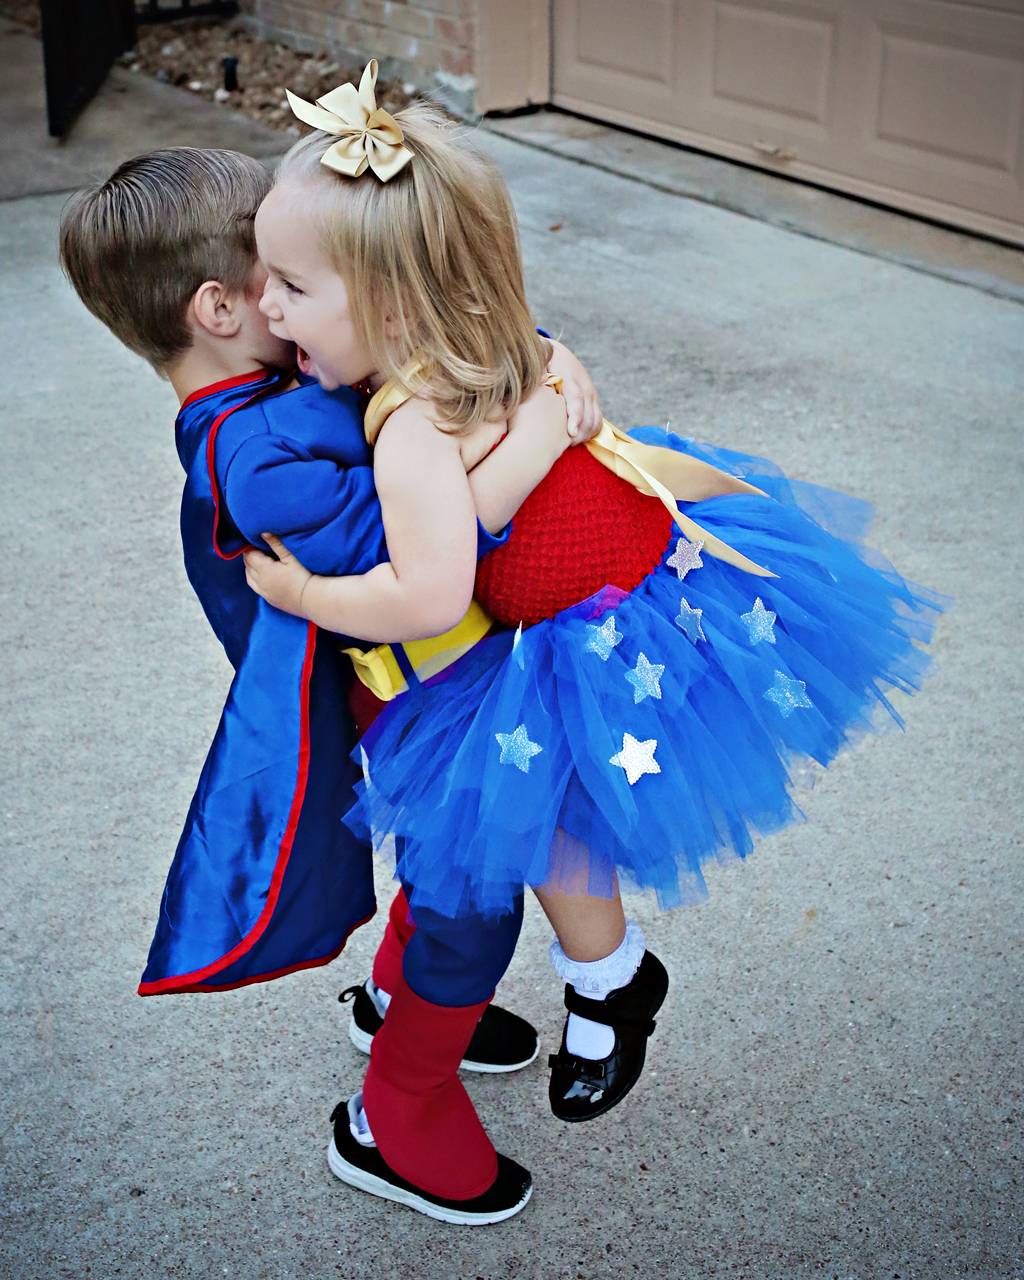 supermanwonderwomandancingkids